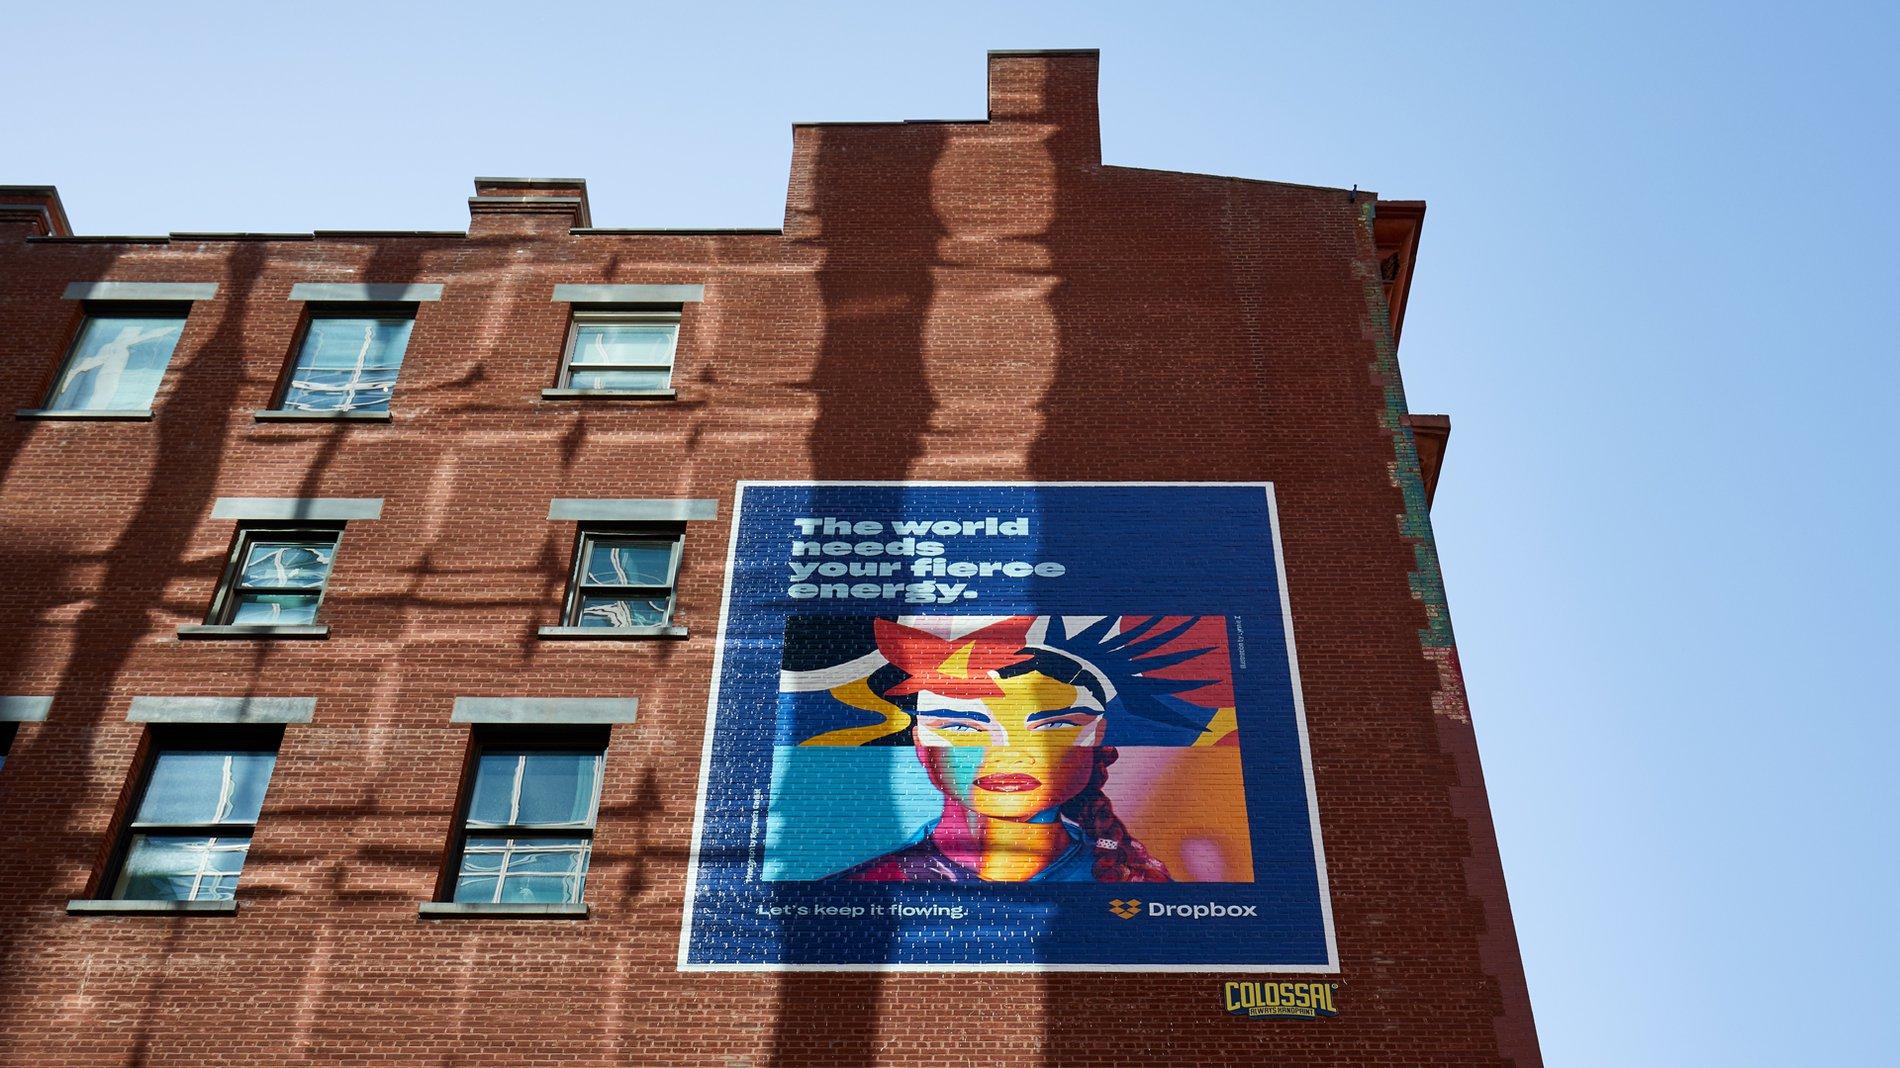 Sharp-Grotesk-Billboard-New-York-City-1920x1080